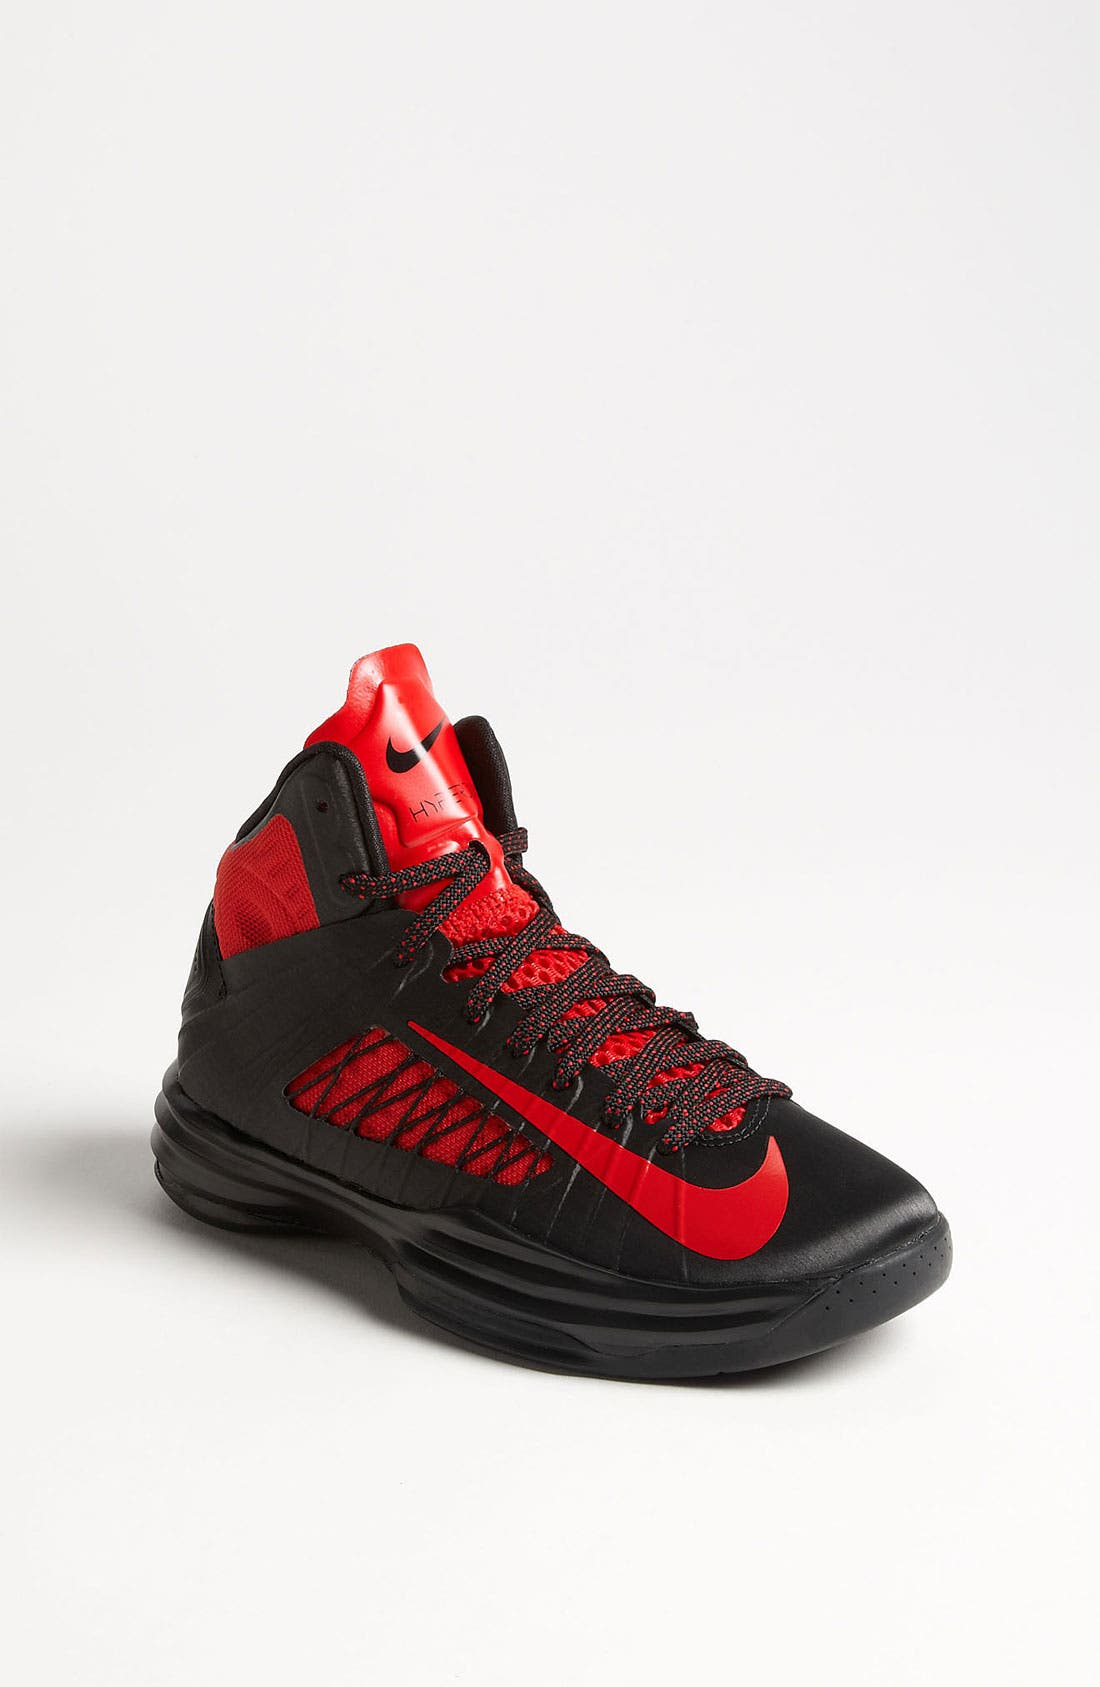 Main Image - Nike 'Lunar Hyperdunk' Basketball Shoe (Big Kid)